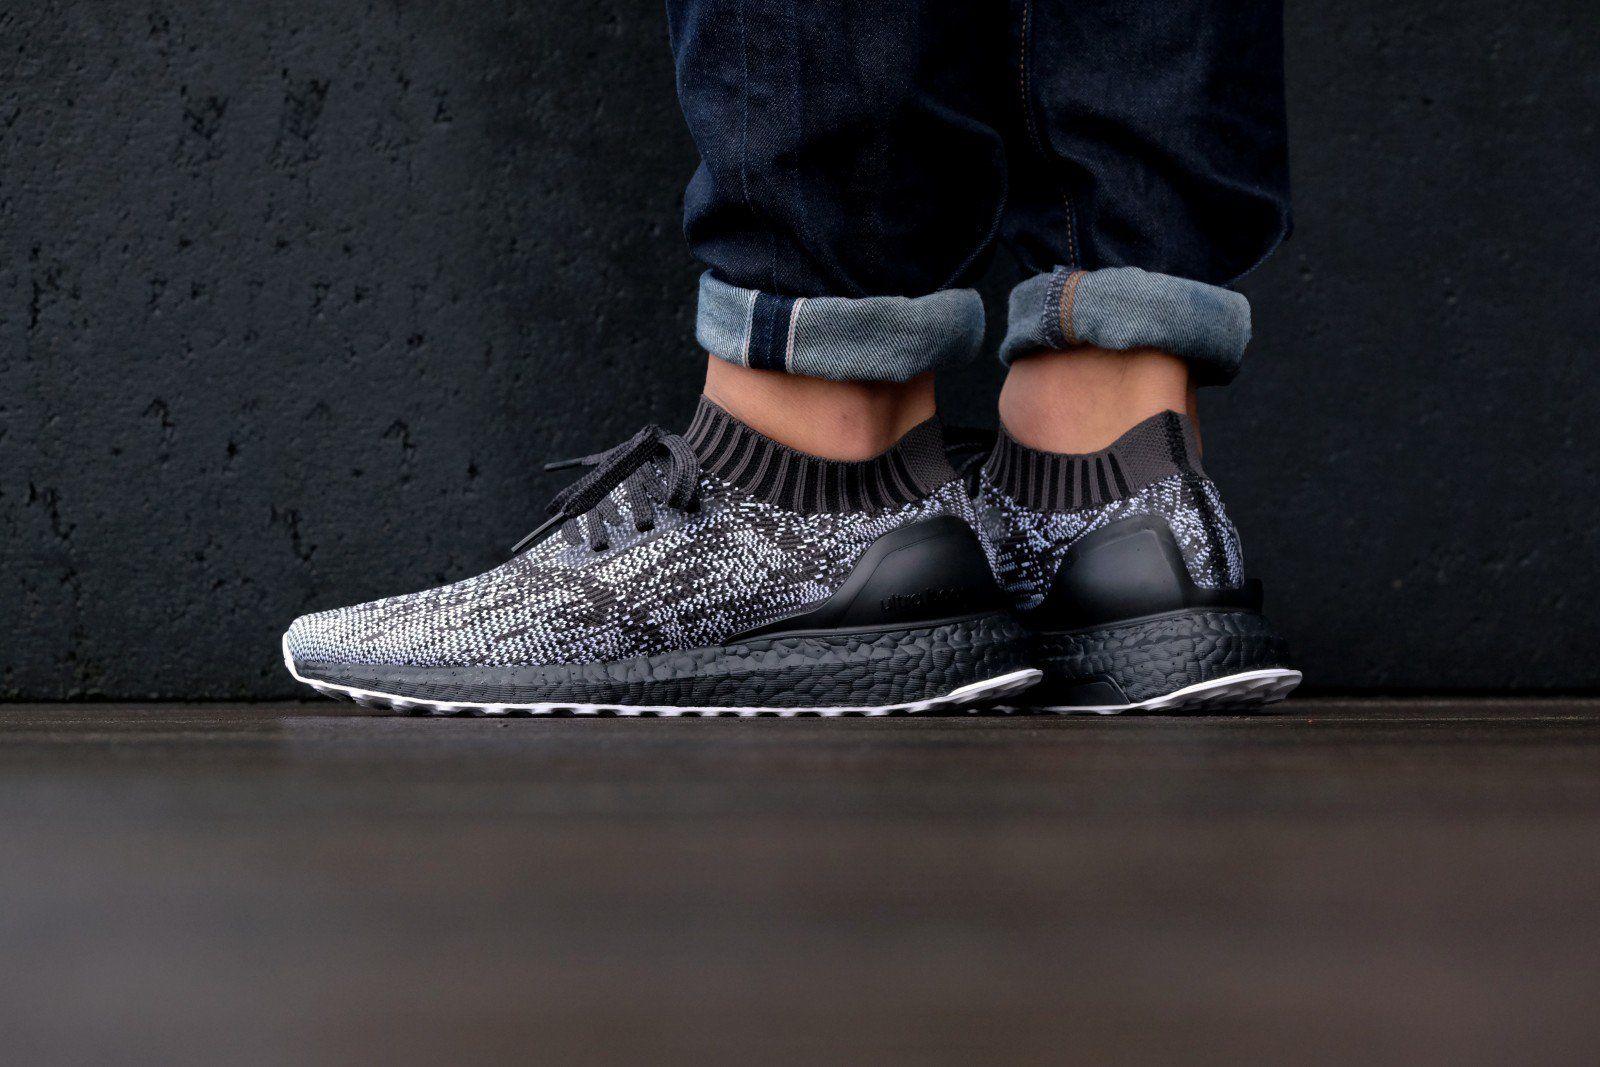 Adidas Ultra Boost Uncaged Black